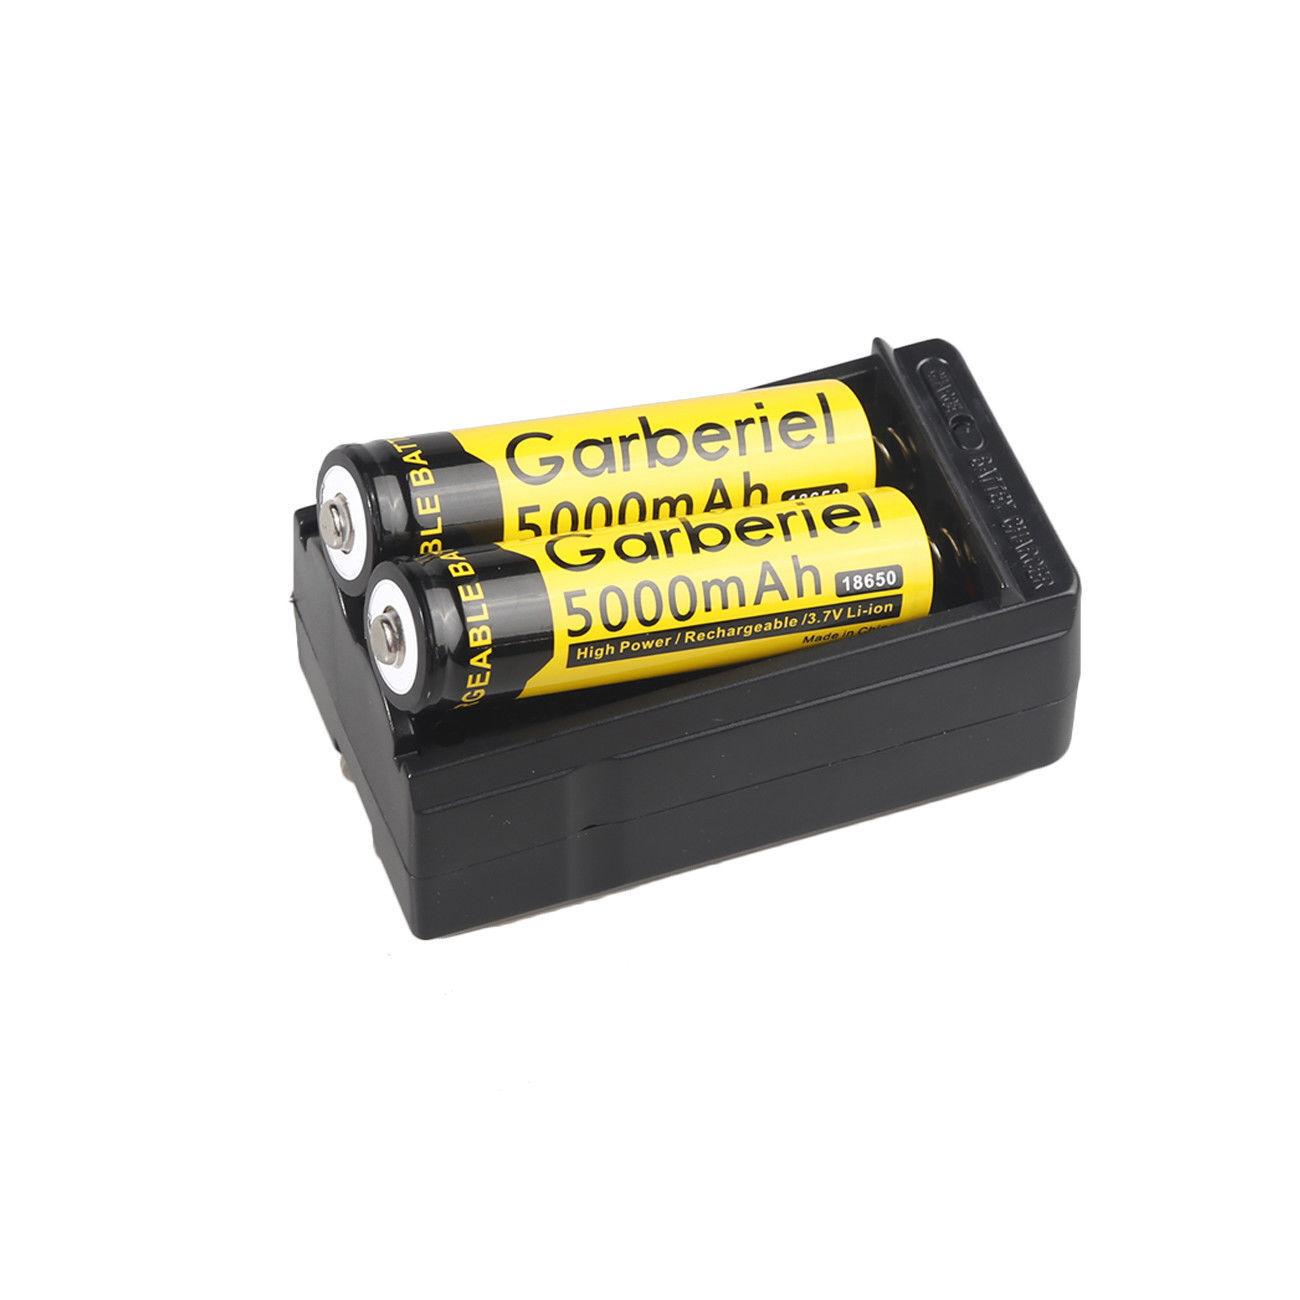 18650 Battery 5000mAh Li-ion 3.7V Rechargeable Batteries for LED Flashlight USA